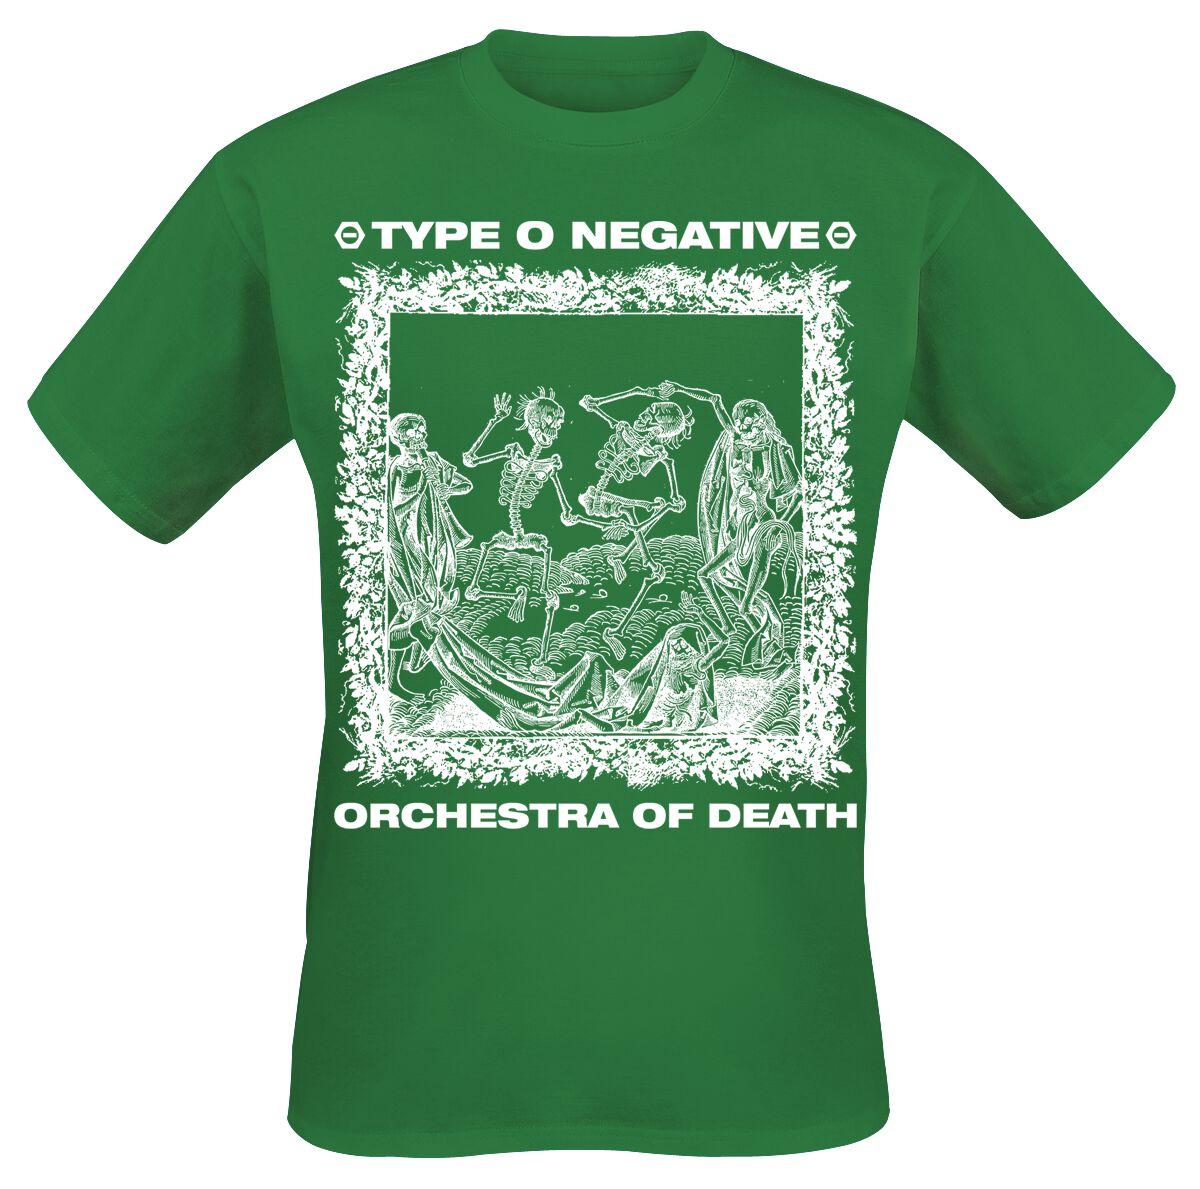 Zespoły - Koszulki - T-Shirt Type O Negative Orchestra Of Death T-Shirt zielony - 363536